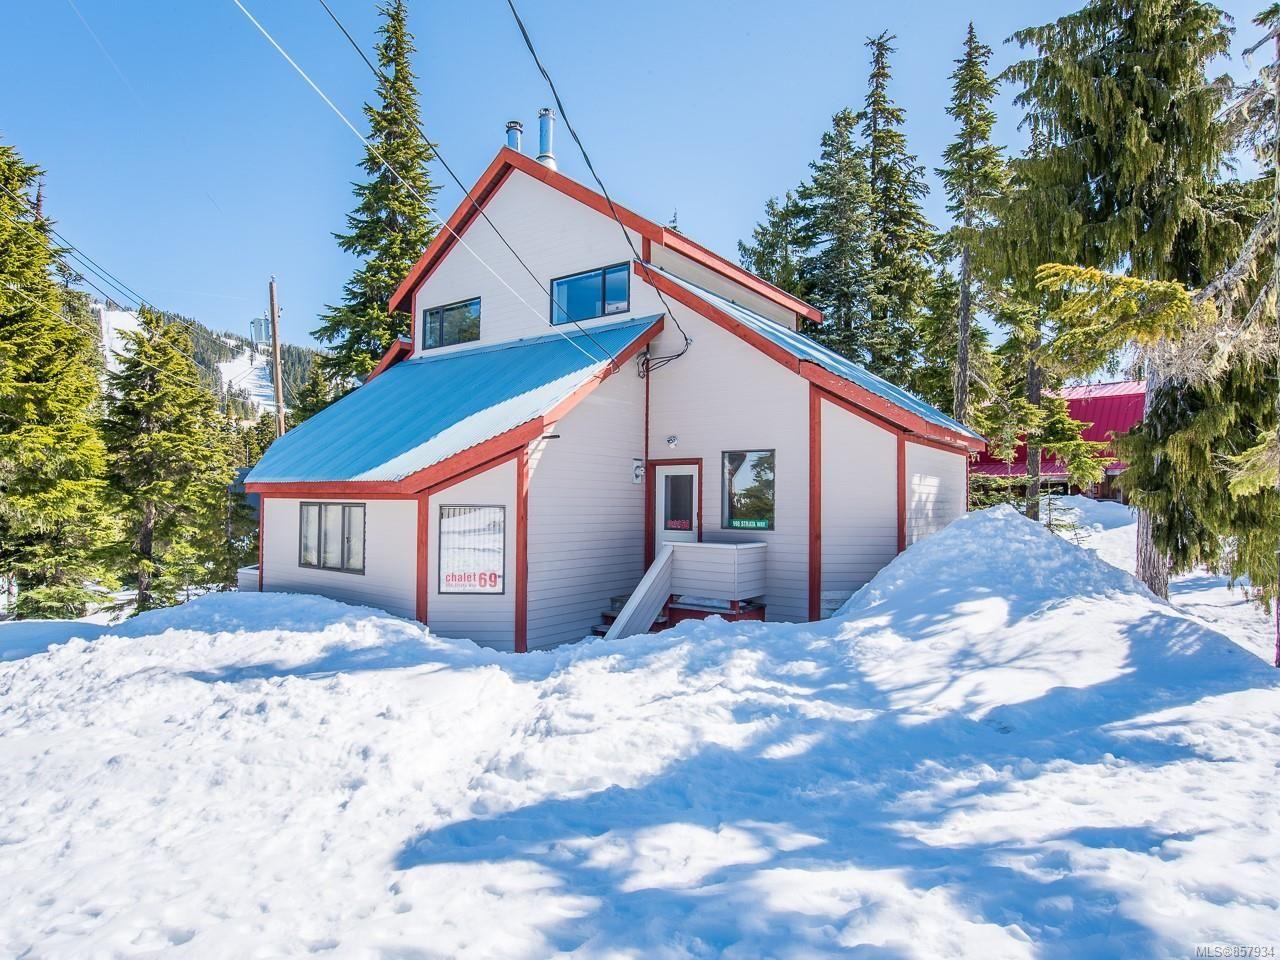 Photo 1: Photos: 998 STRATA Way in : CV Mt Washington House for sale (Comox Valley)  : MLS®# 857934